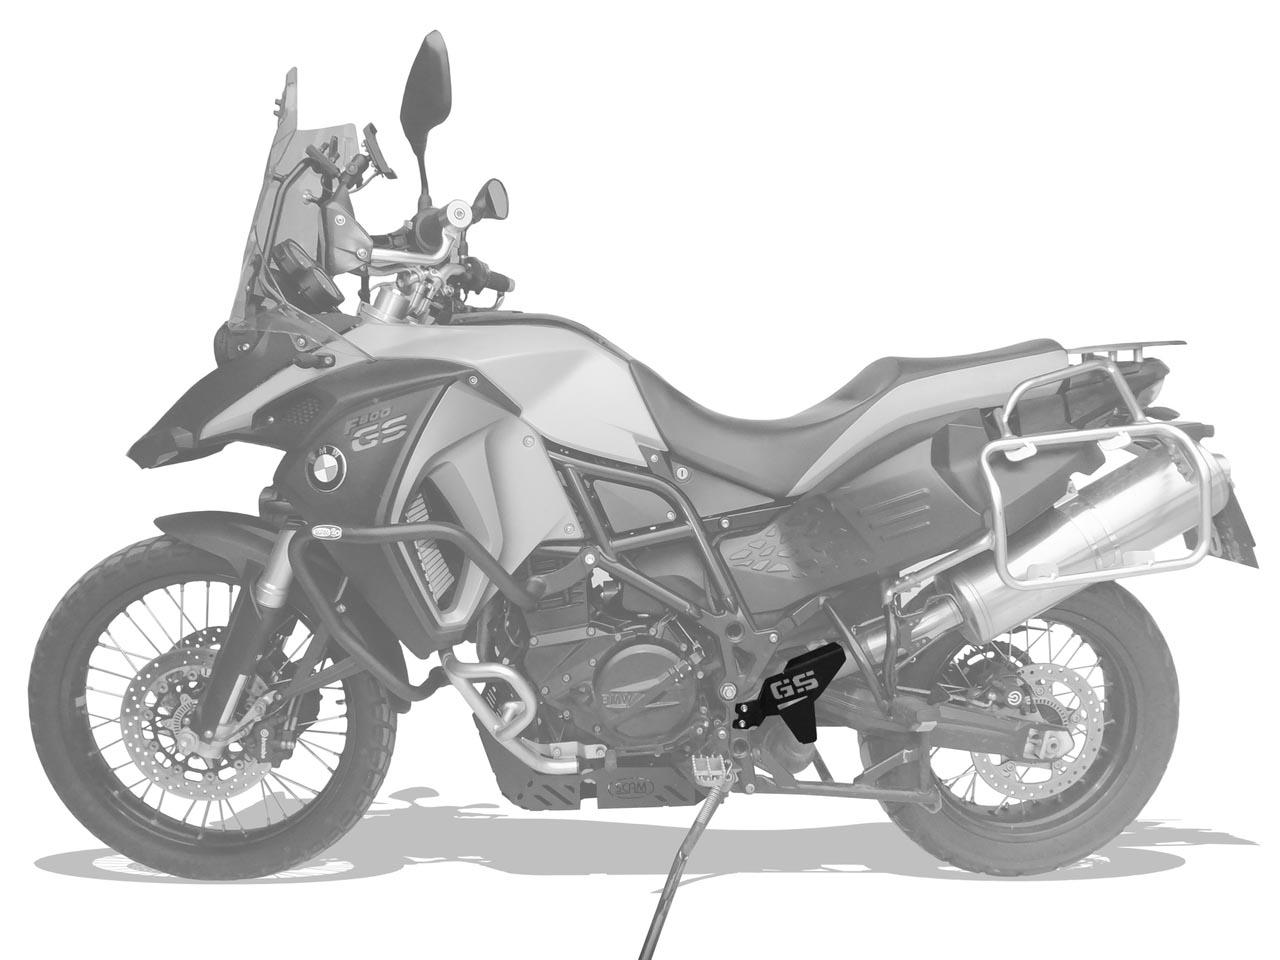 Protetor de Escapamento BMW F800 GS / ADVENTURE